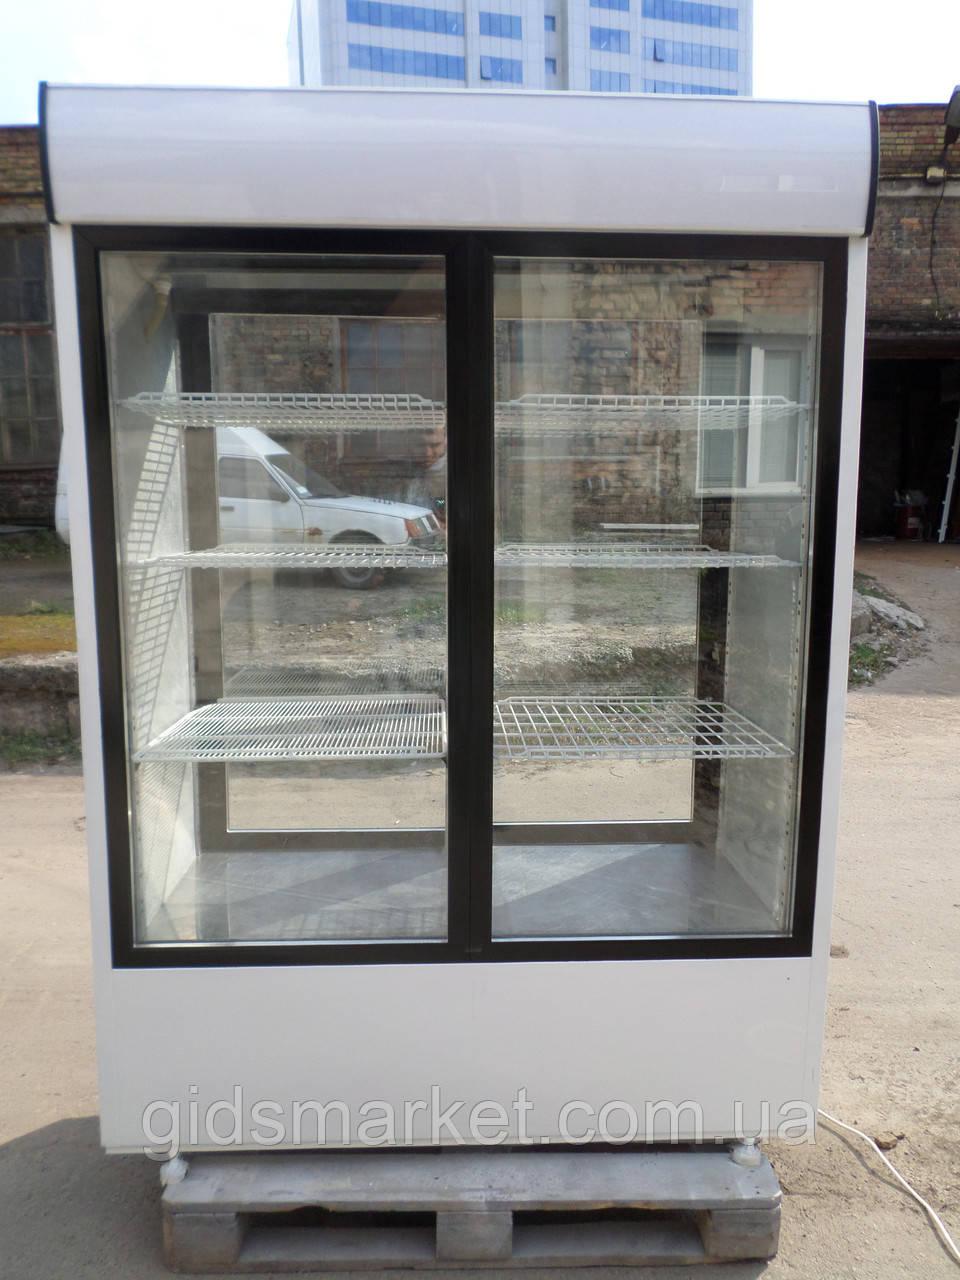 Шкаф-витрина холодильная COLD- SW 1400 бу, холодильный шкаф-купе  б/у